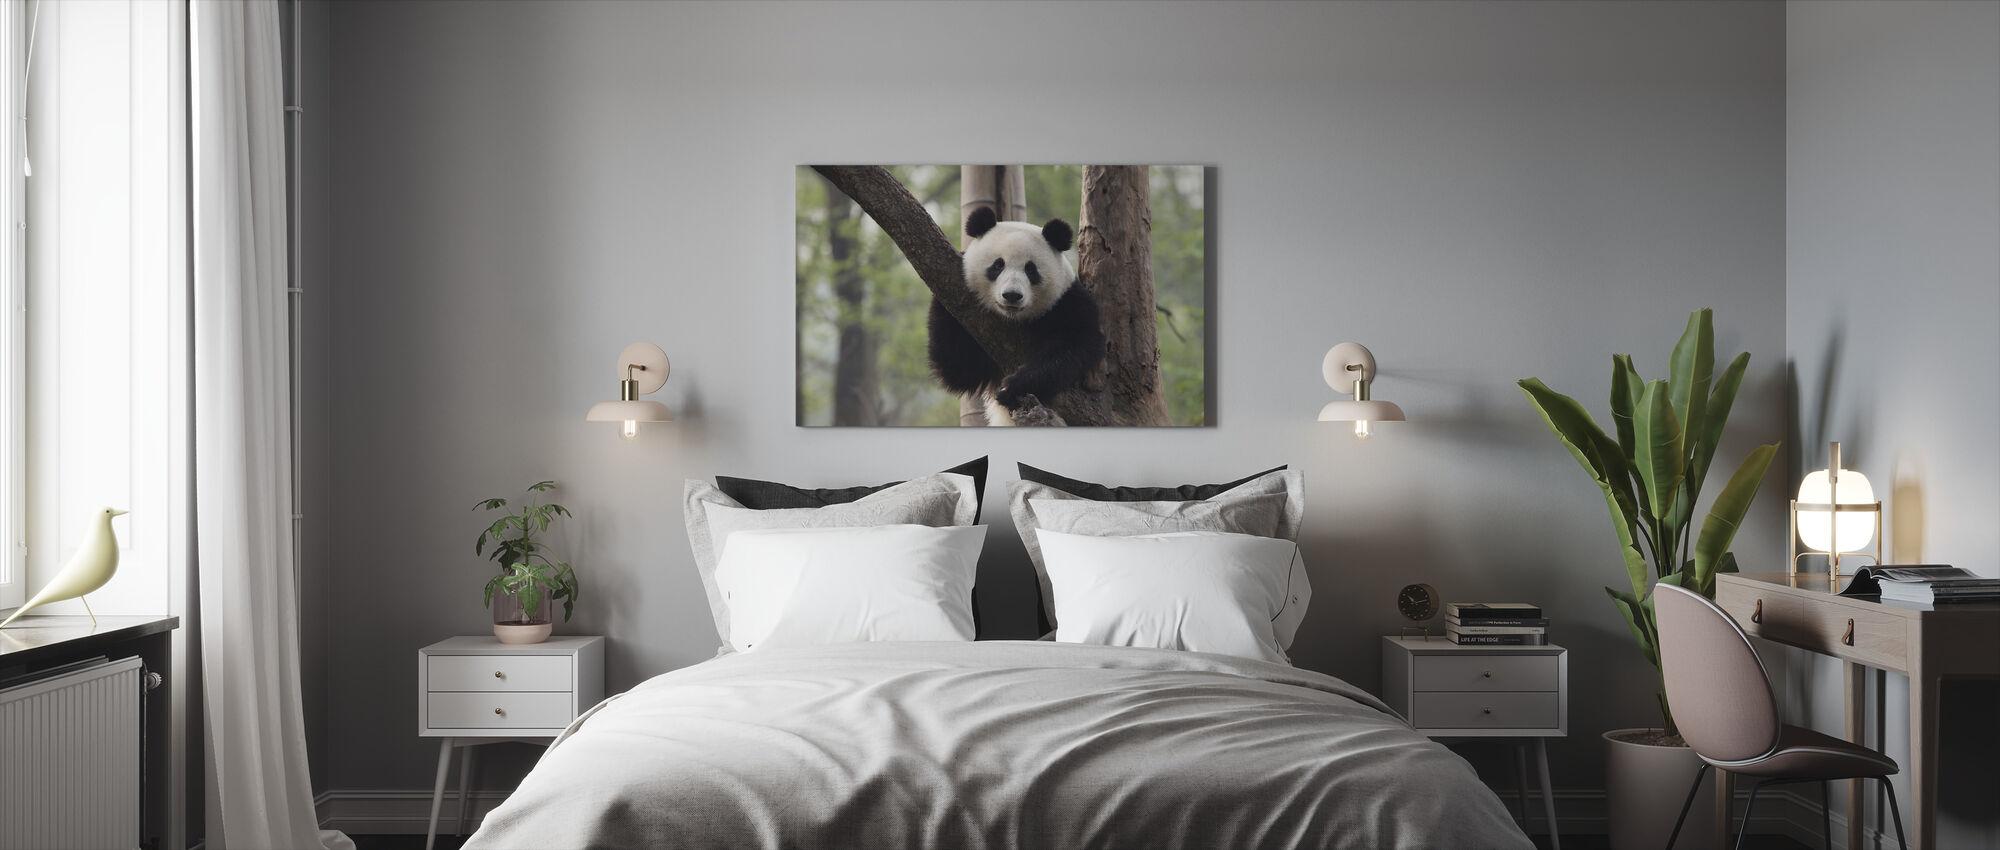 Zoete Panda - Canvas print - Slaapkamer